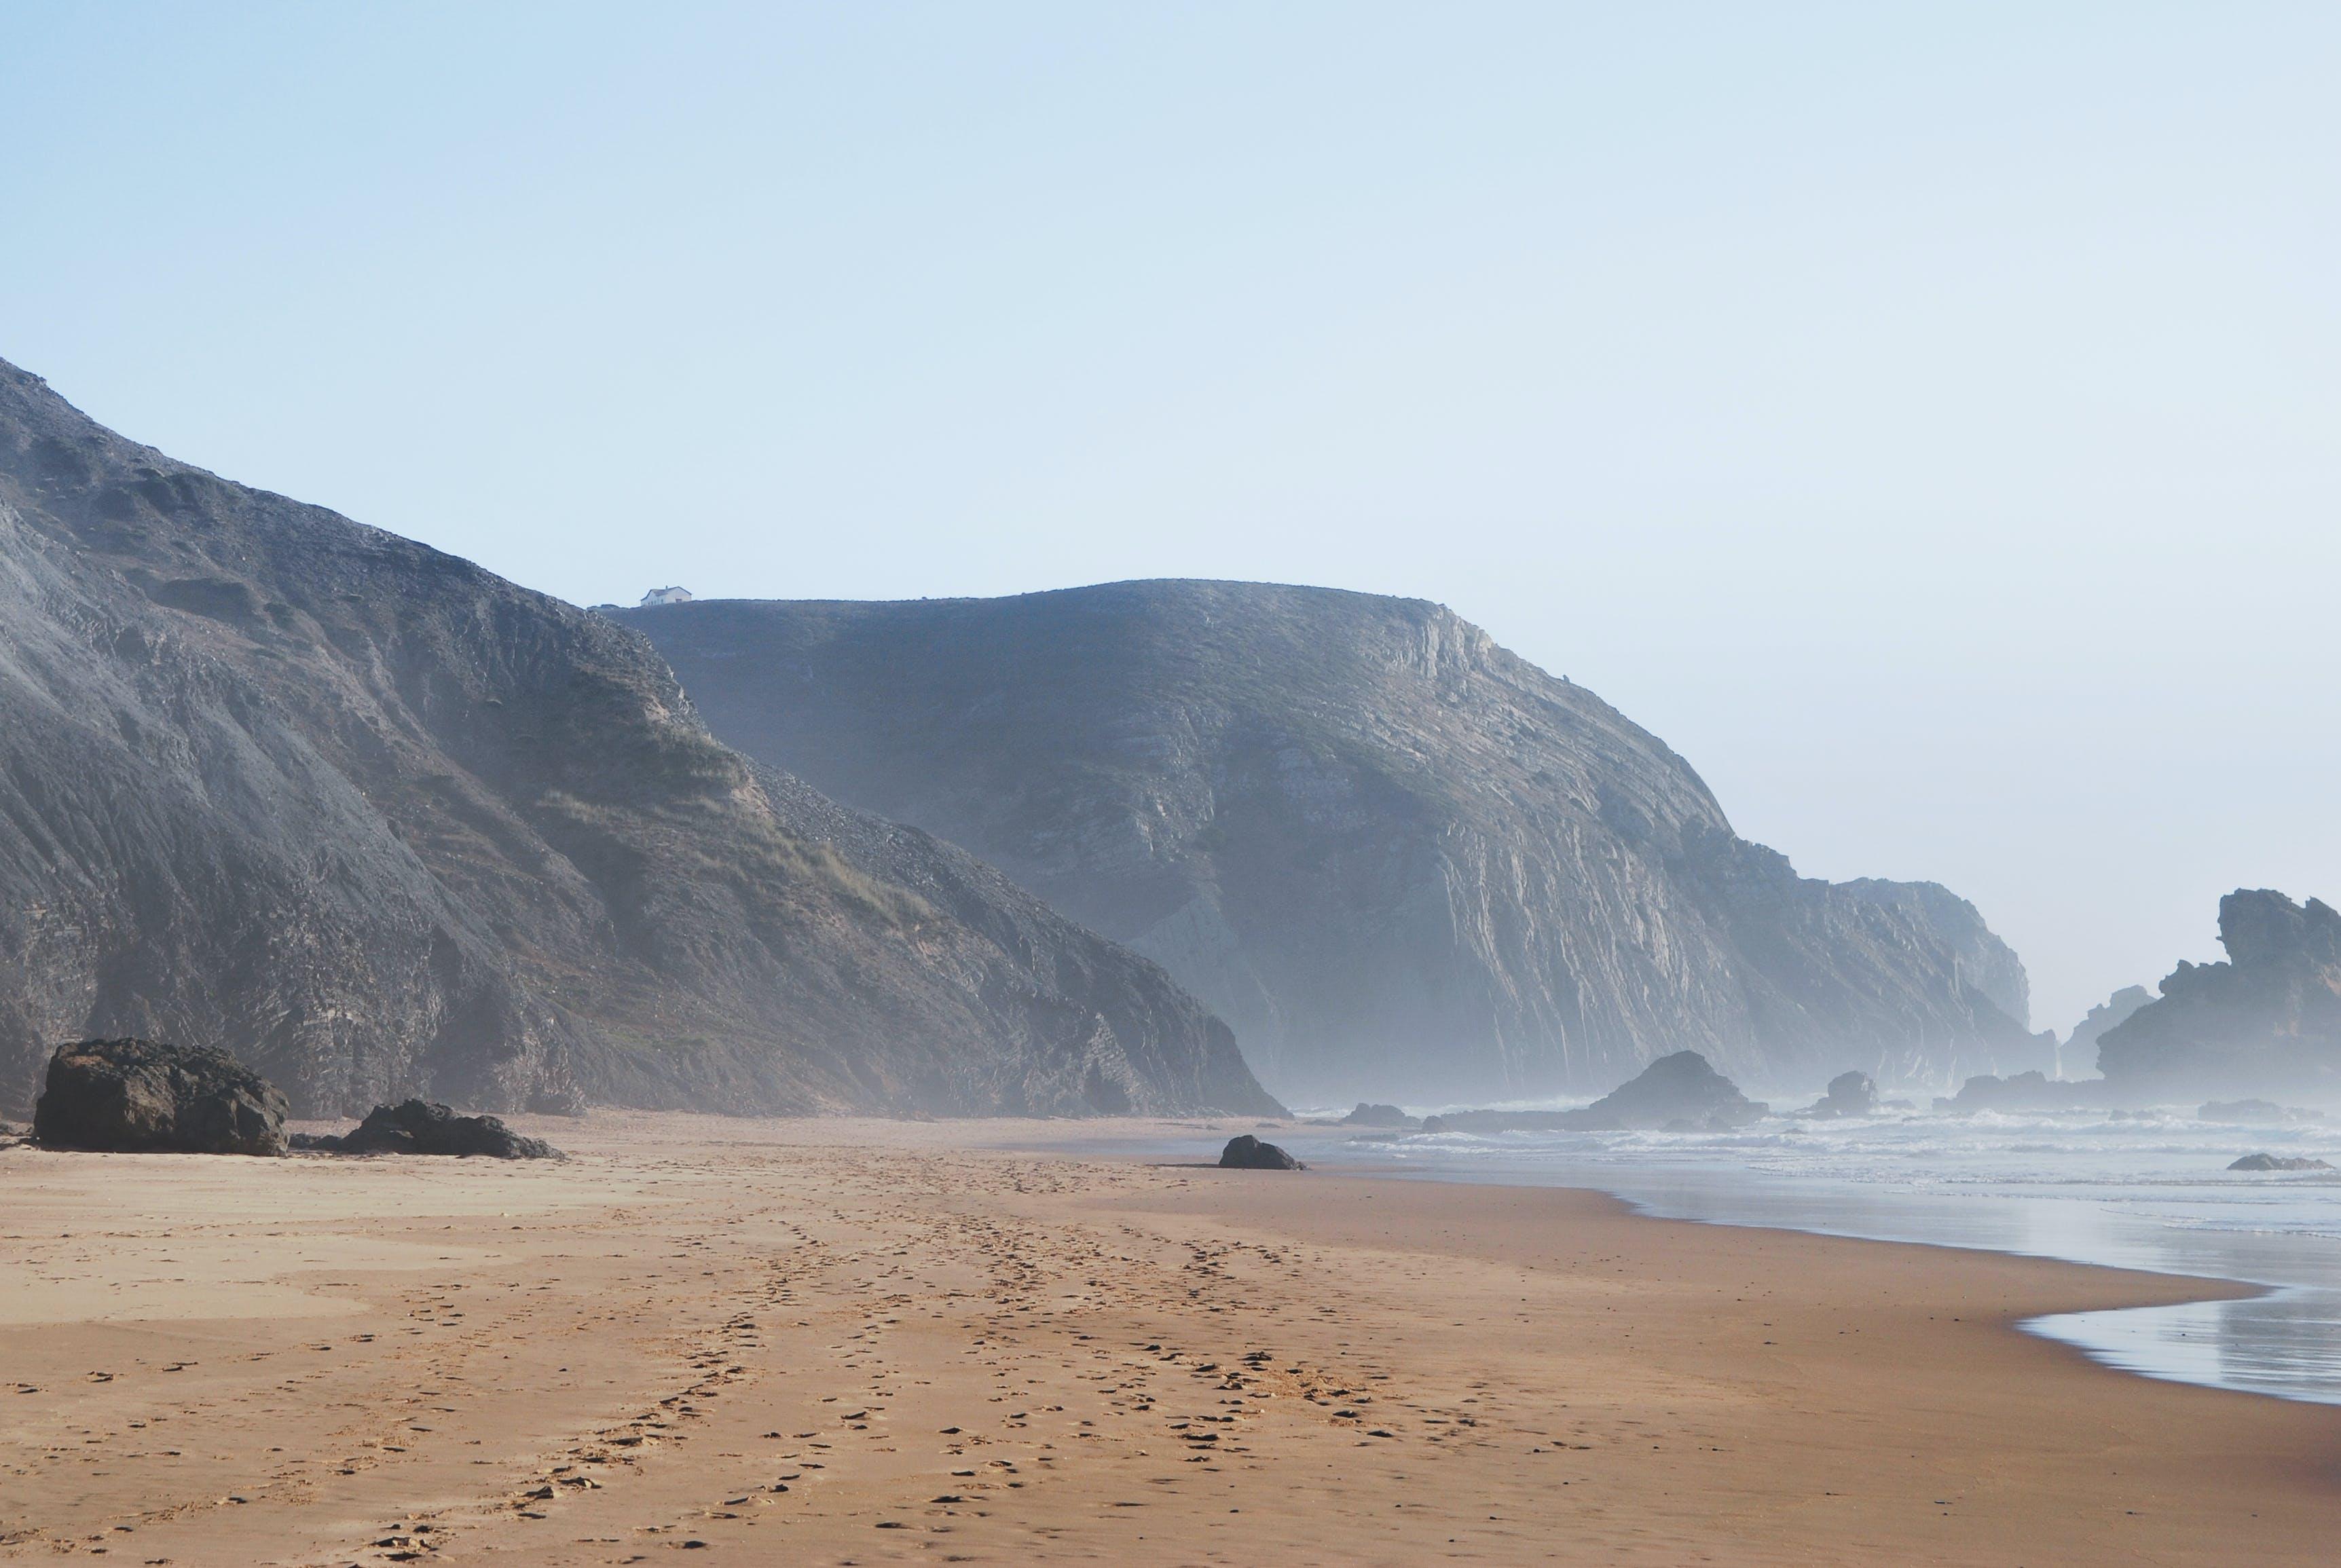 beach, calmness, coast